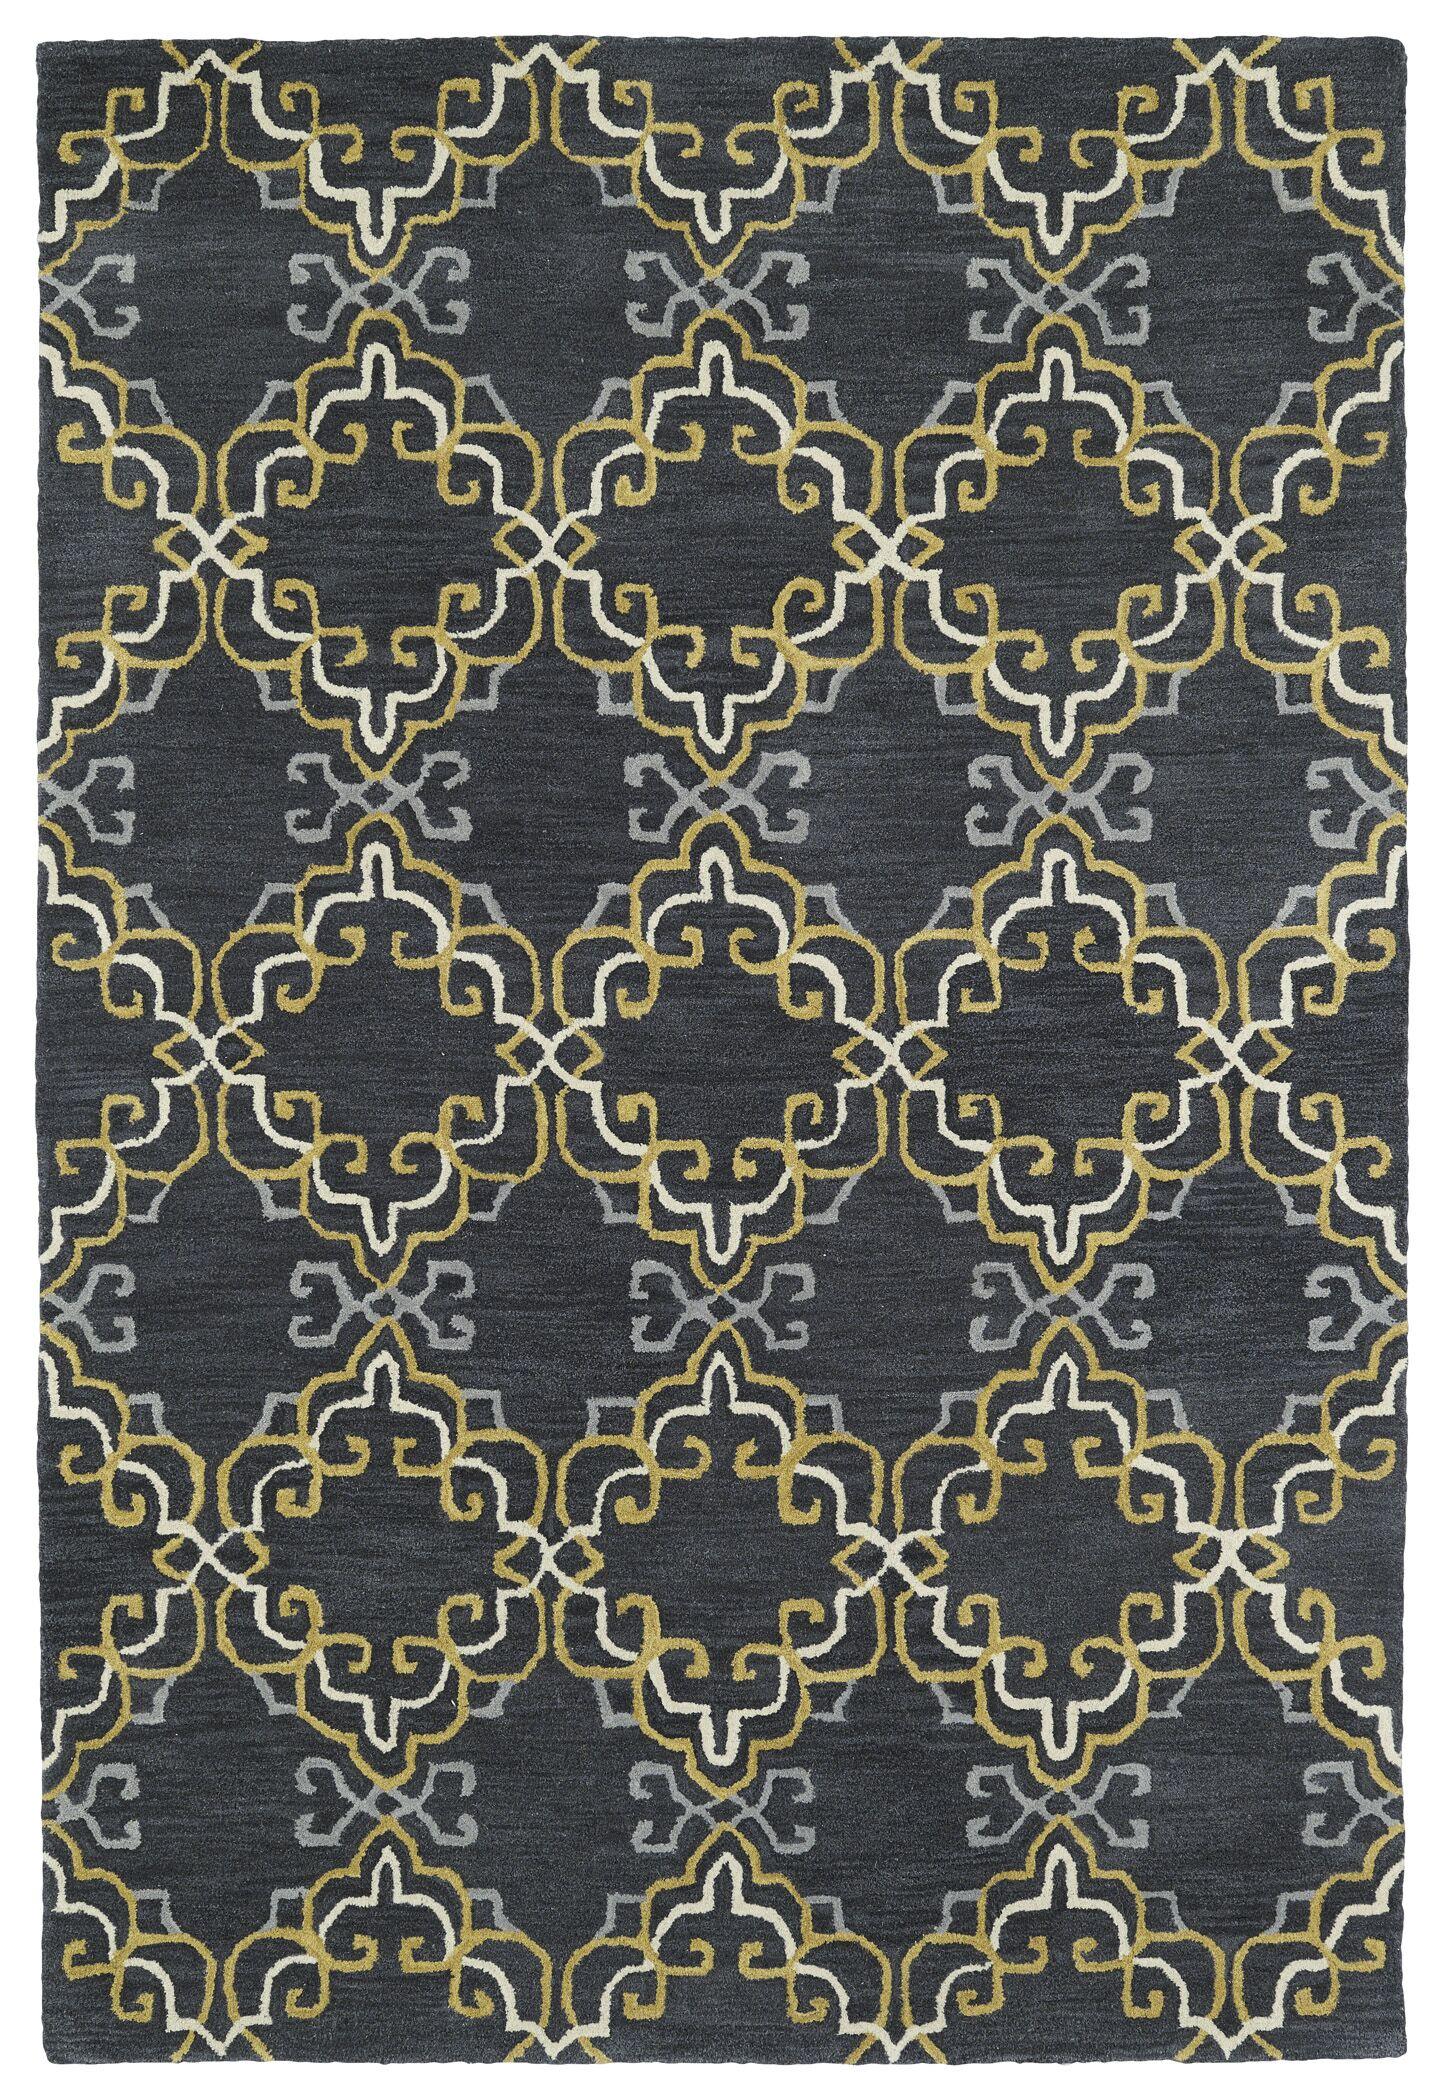 Newburgh Hand-Tufted Area Rug Rug Size: Rectangle 8' x 10'